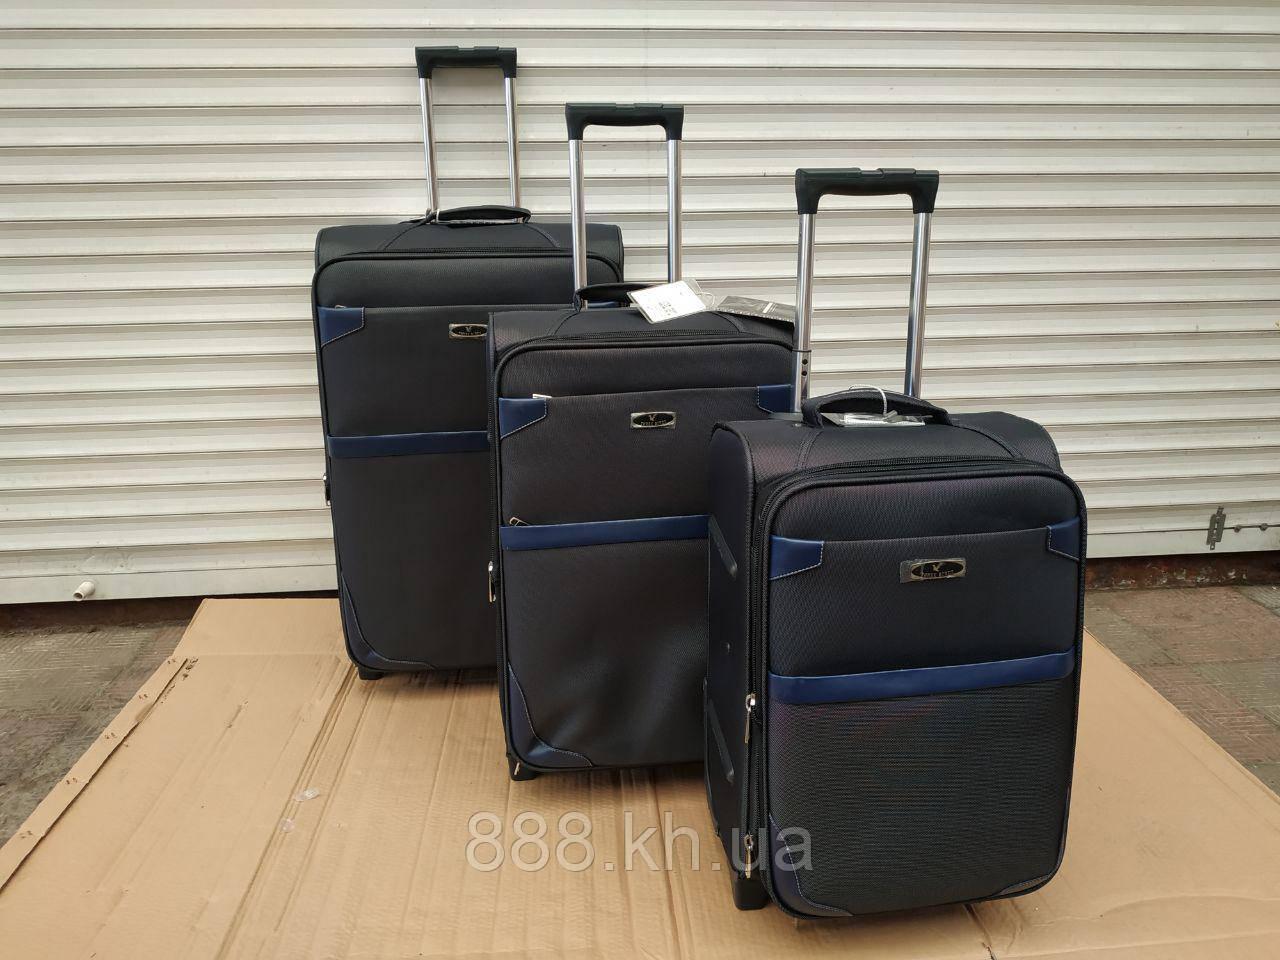 "Набор чемоданов Three birds 20"",23"",26"" с расширением (3шт) на 2-х колесах, набір валізи (синий)"